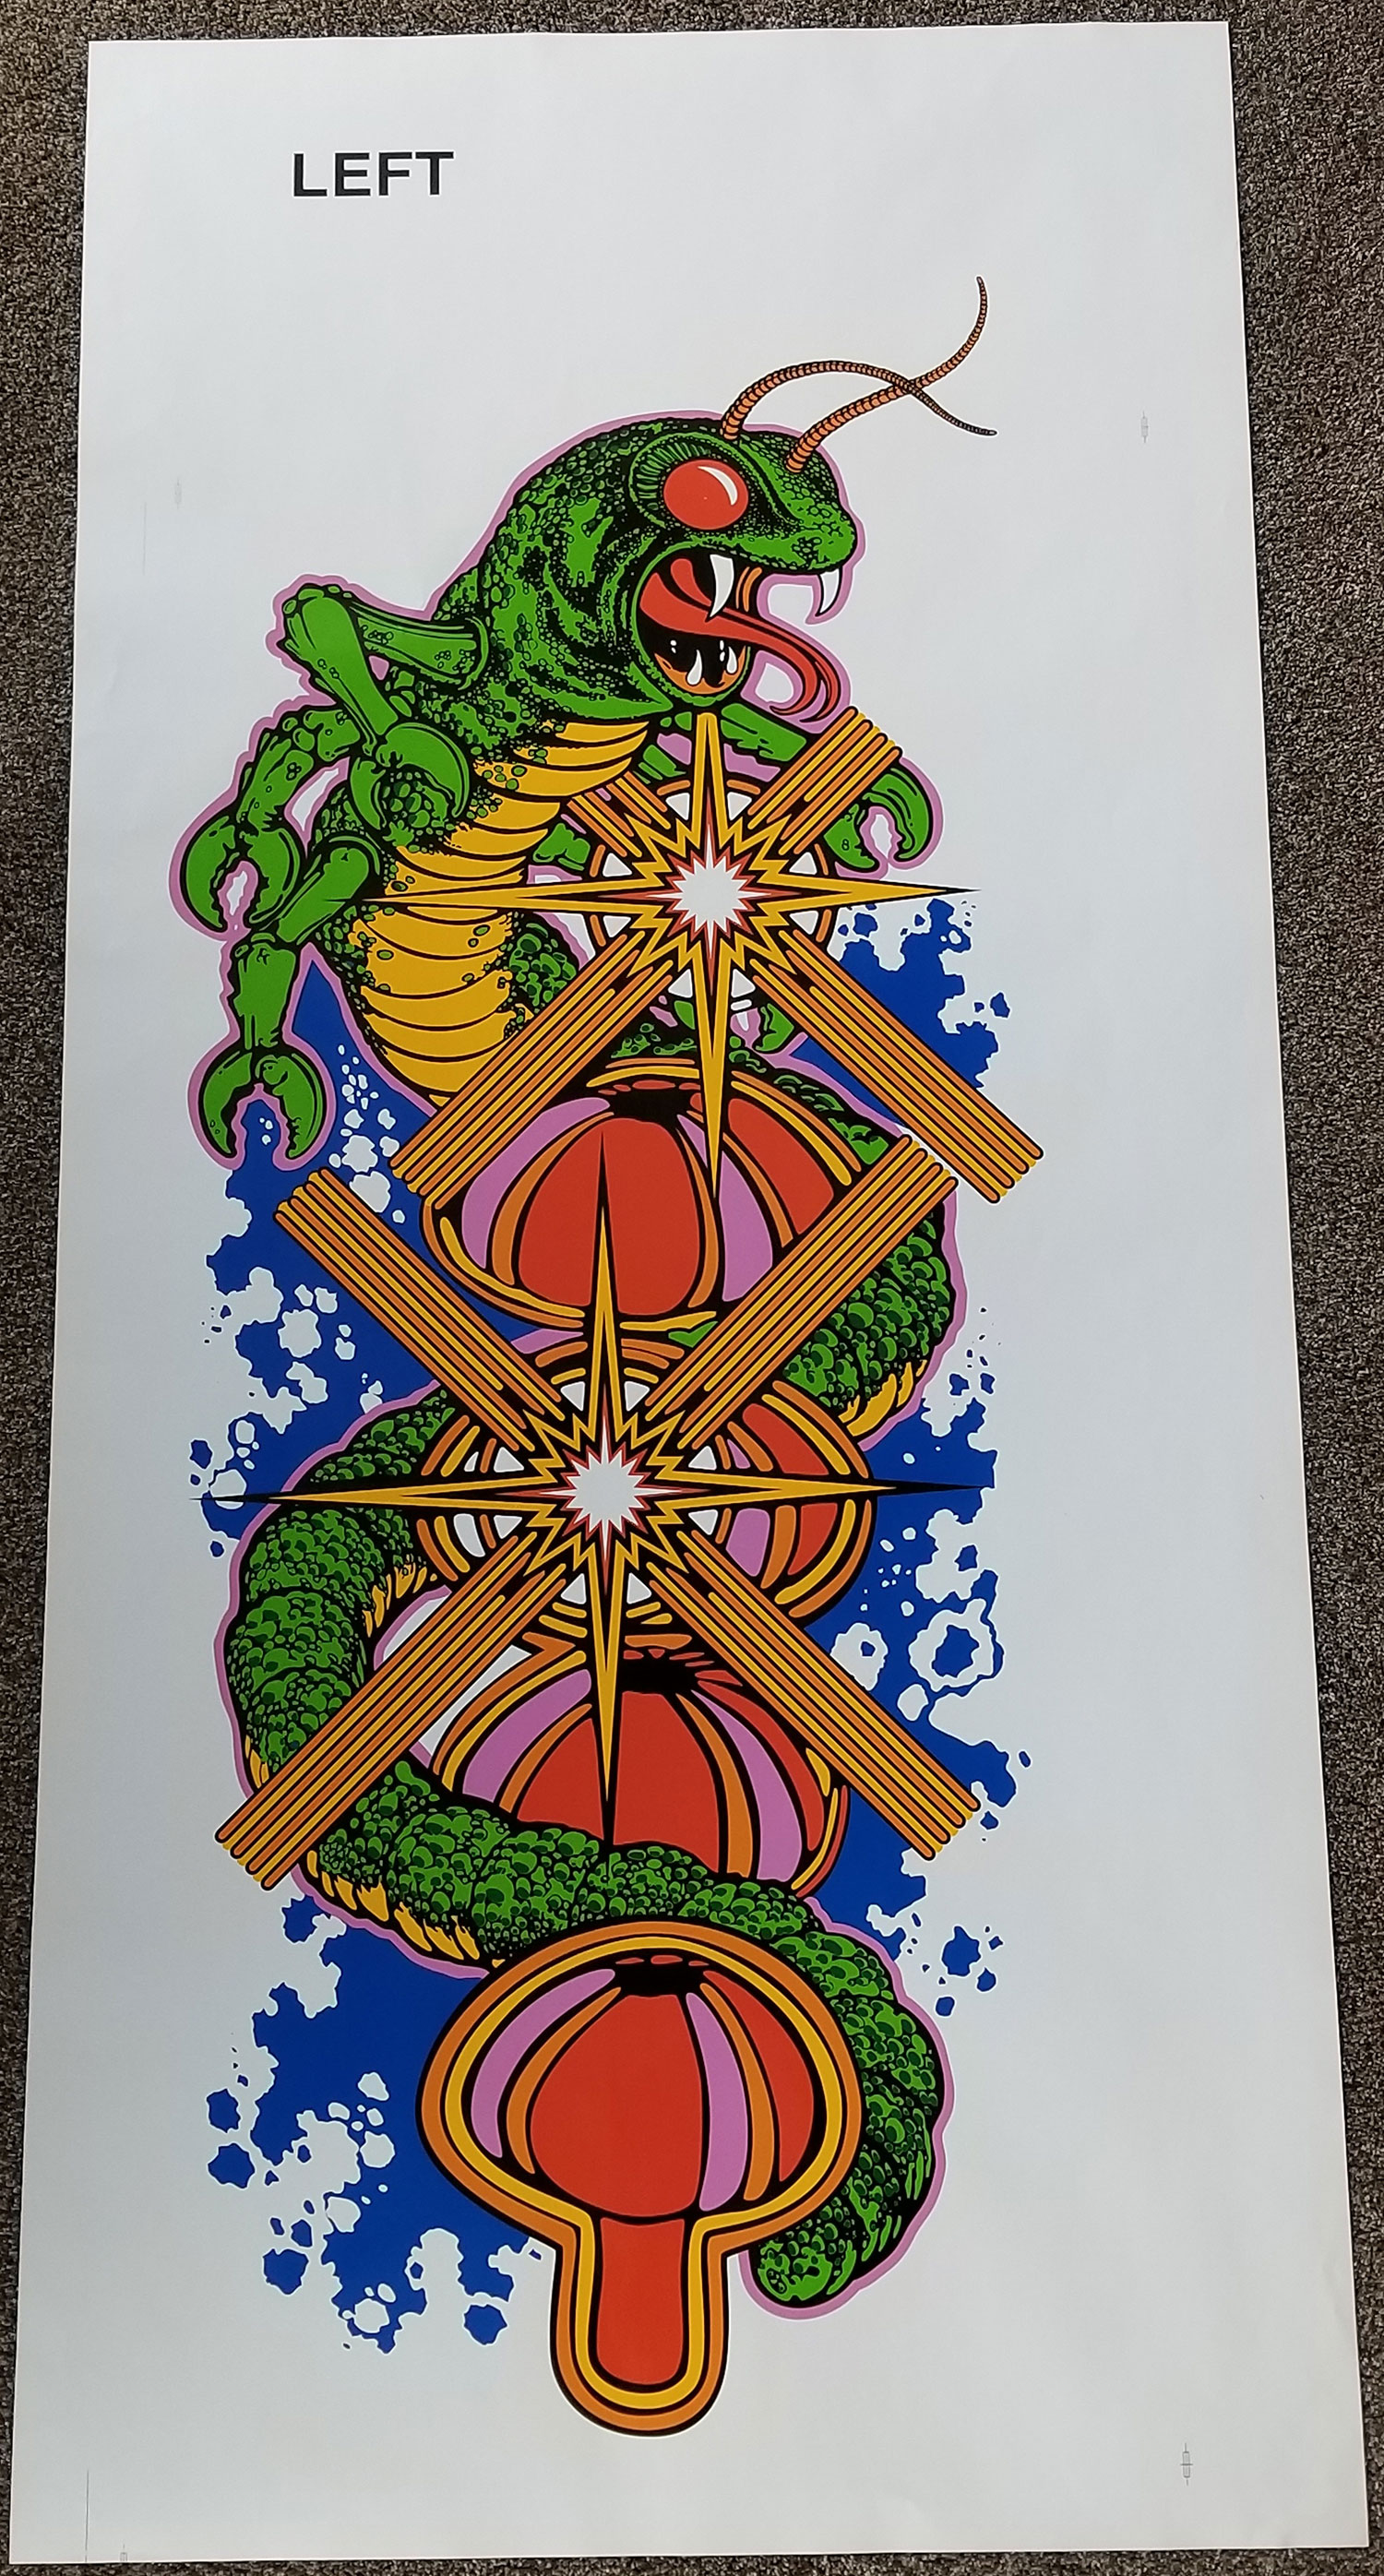 Centipede Full Sized Upright Side Art Phoenix Arcade 1 Source For Screen Printed Arcade Artwork